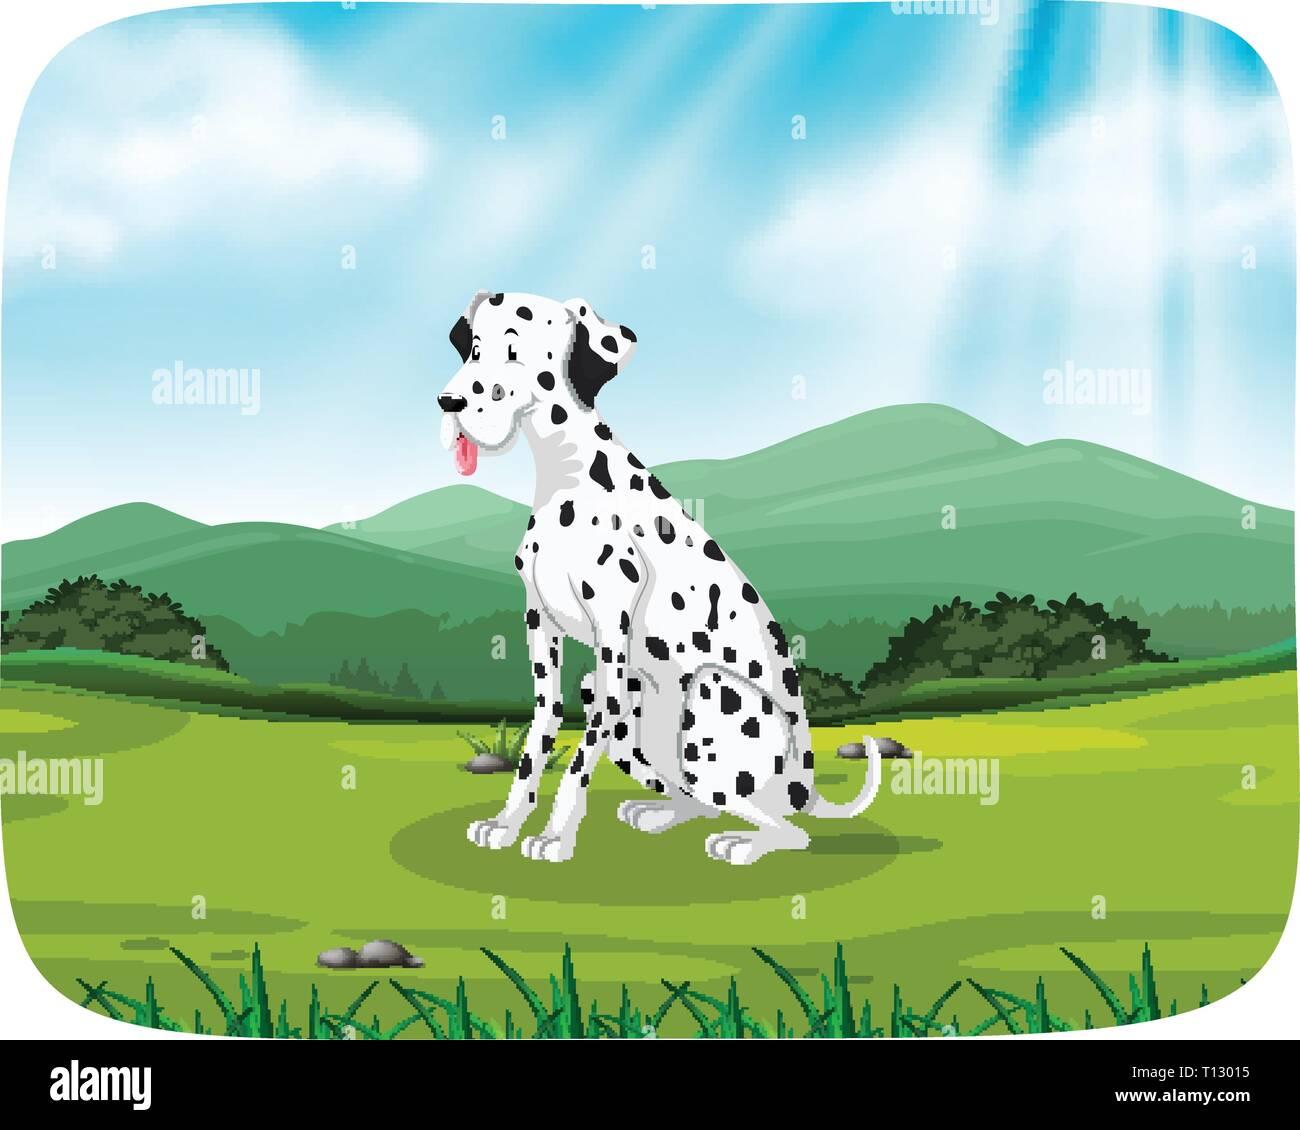 Dalmatian on nature scene illustration - Stock Vector